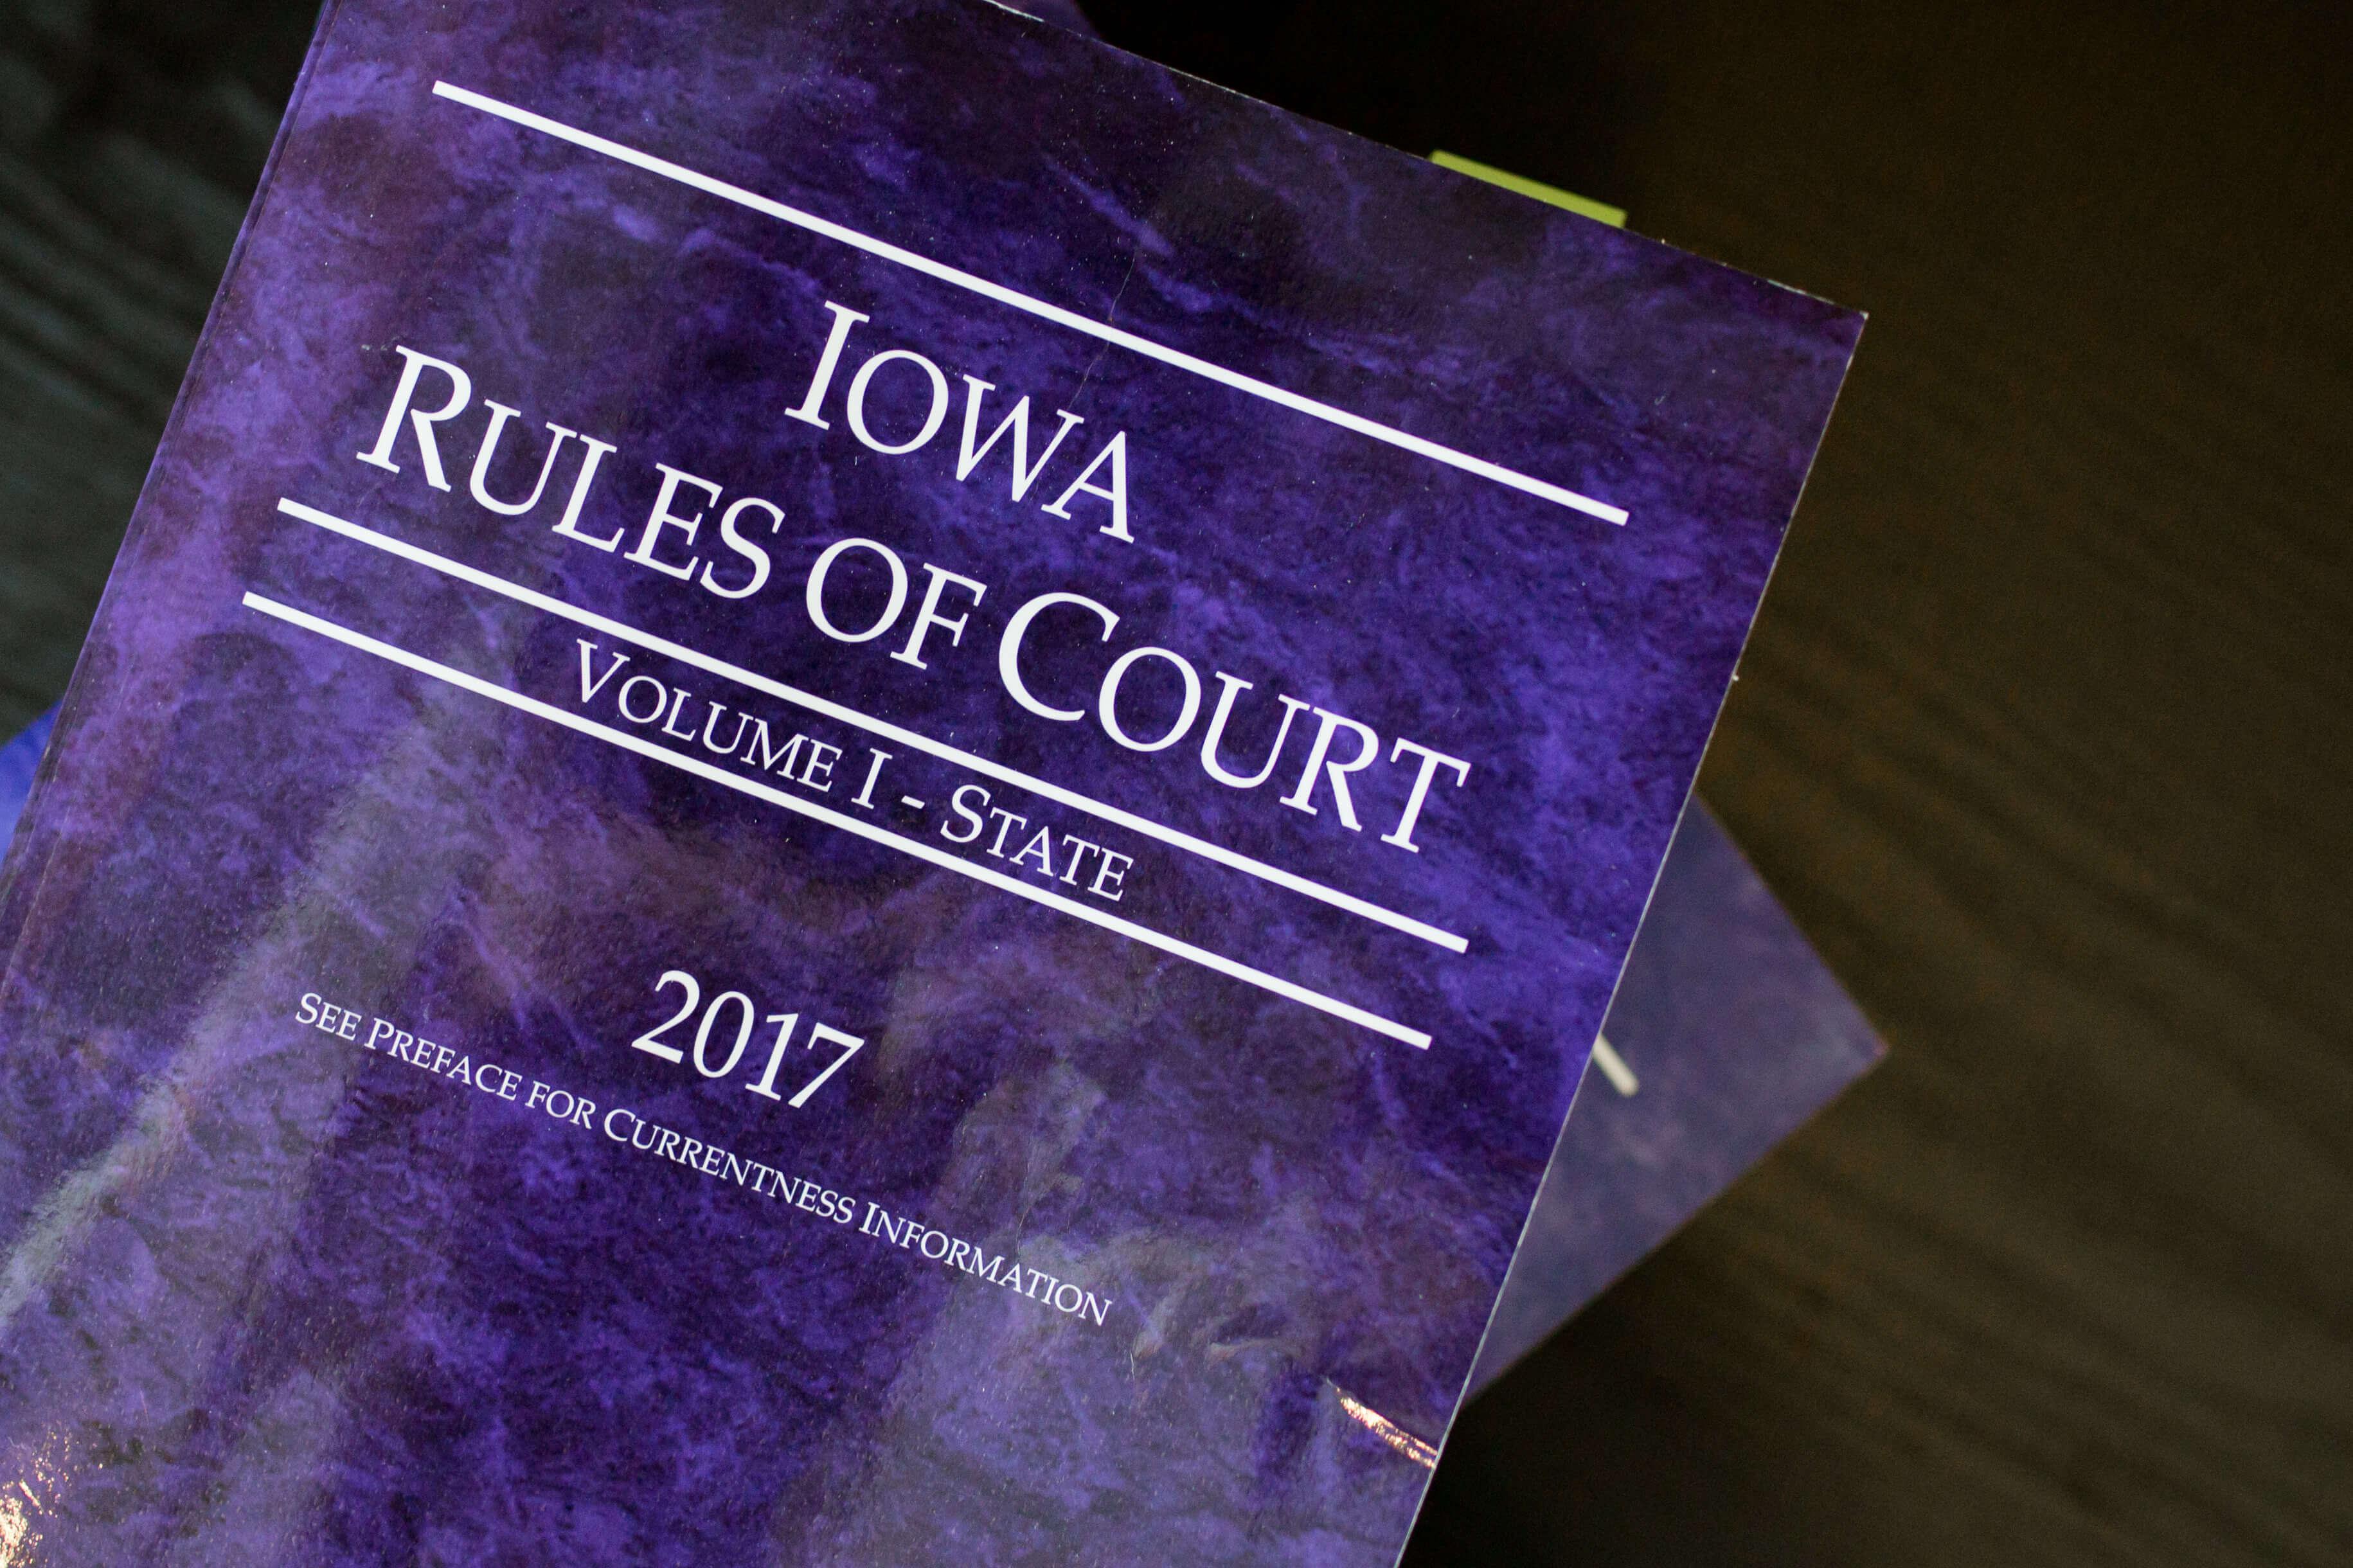 Putnam, Fern & Thompson Law Office | Iowa Rules Of Court